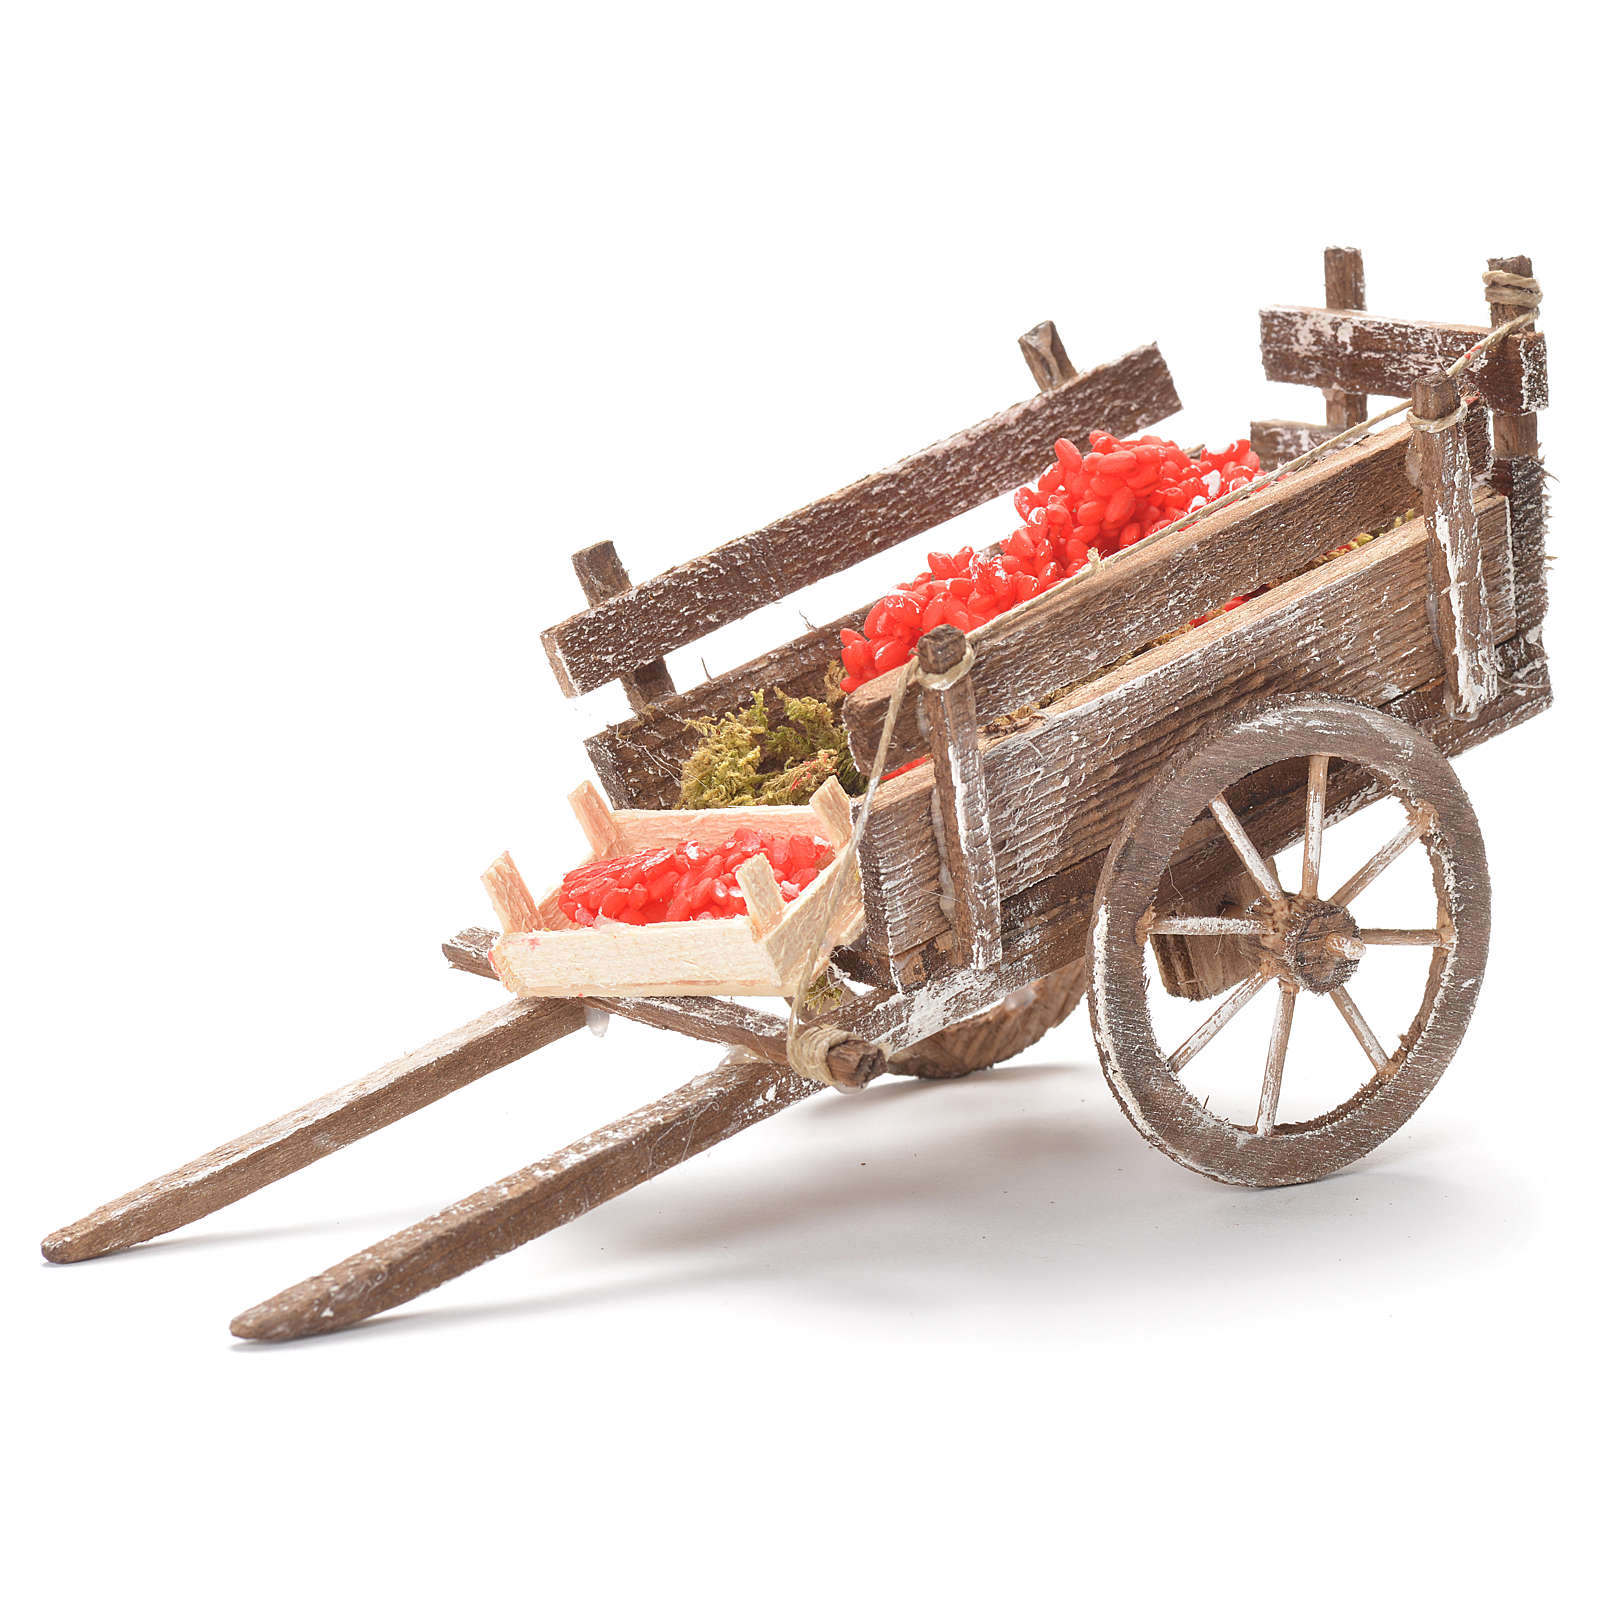 Cart with tomatoes, Neapolitan Nativity 12x20x8cm 4